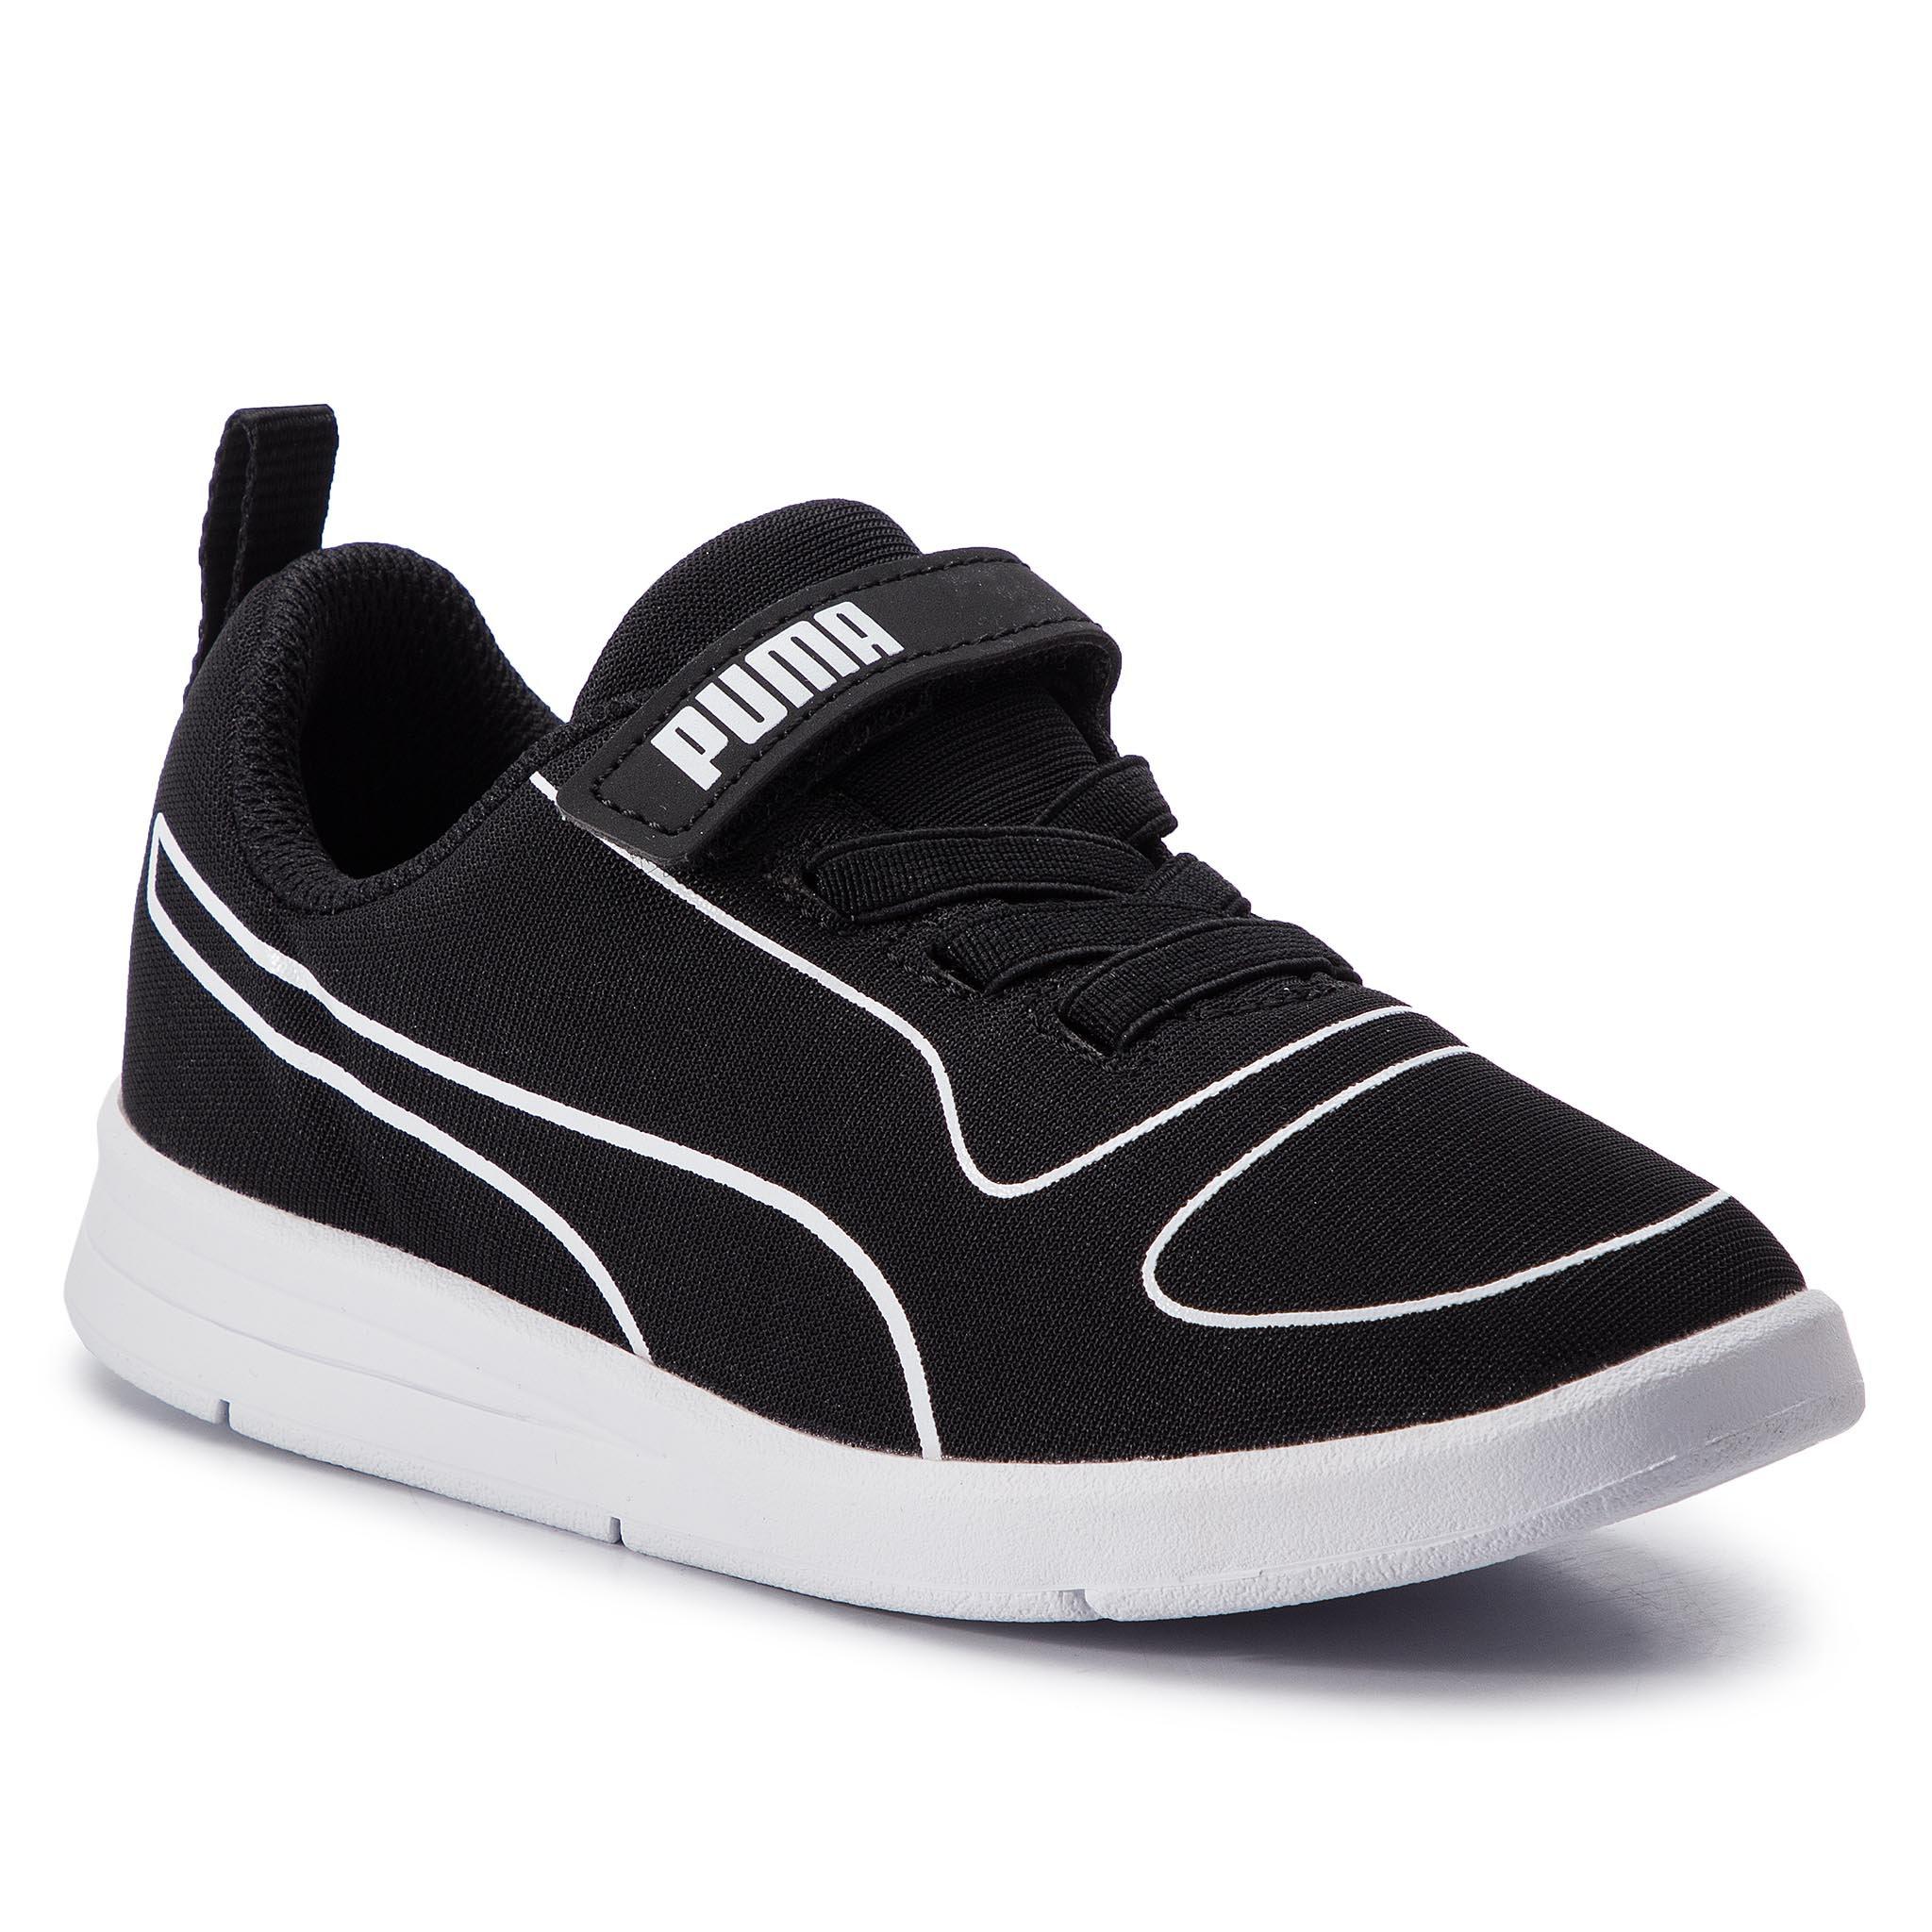 3107fd571 Sports footwear Puma 36779601 Kali V PS Black Kid's - For boy -  https://ccc.eu